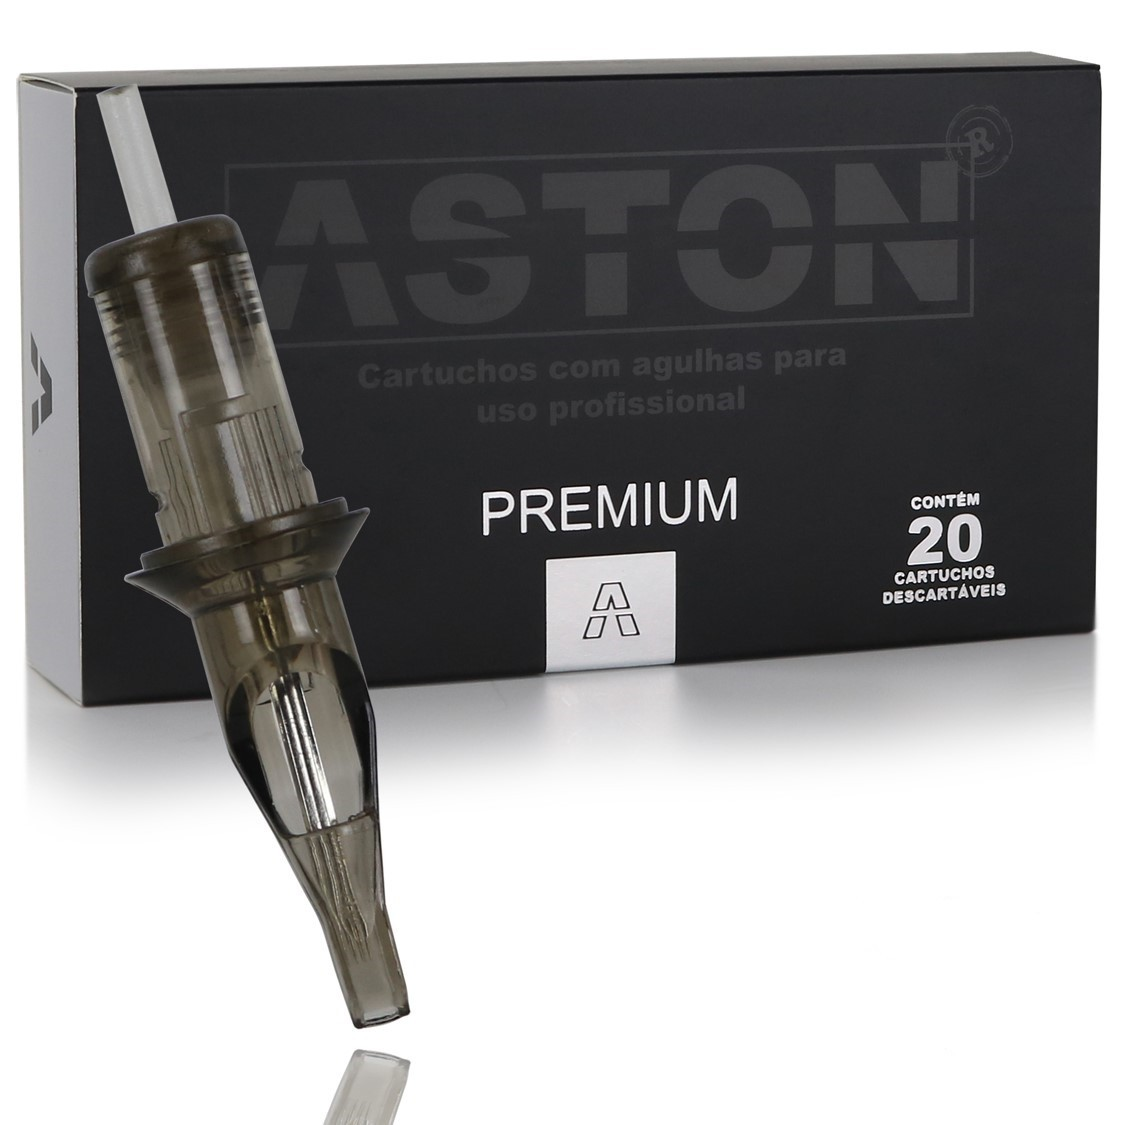 CARTUCHO ASTON PREMIUM BUCHA RS - 1211RS